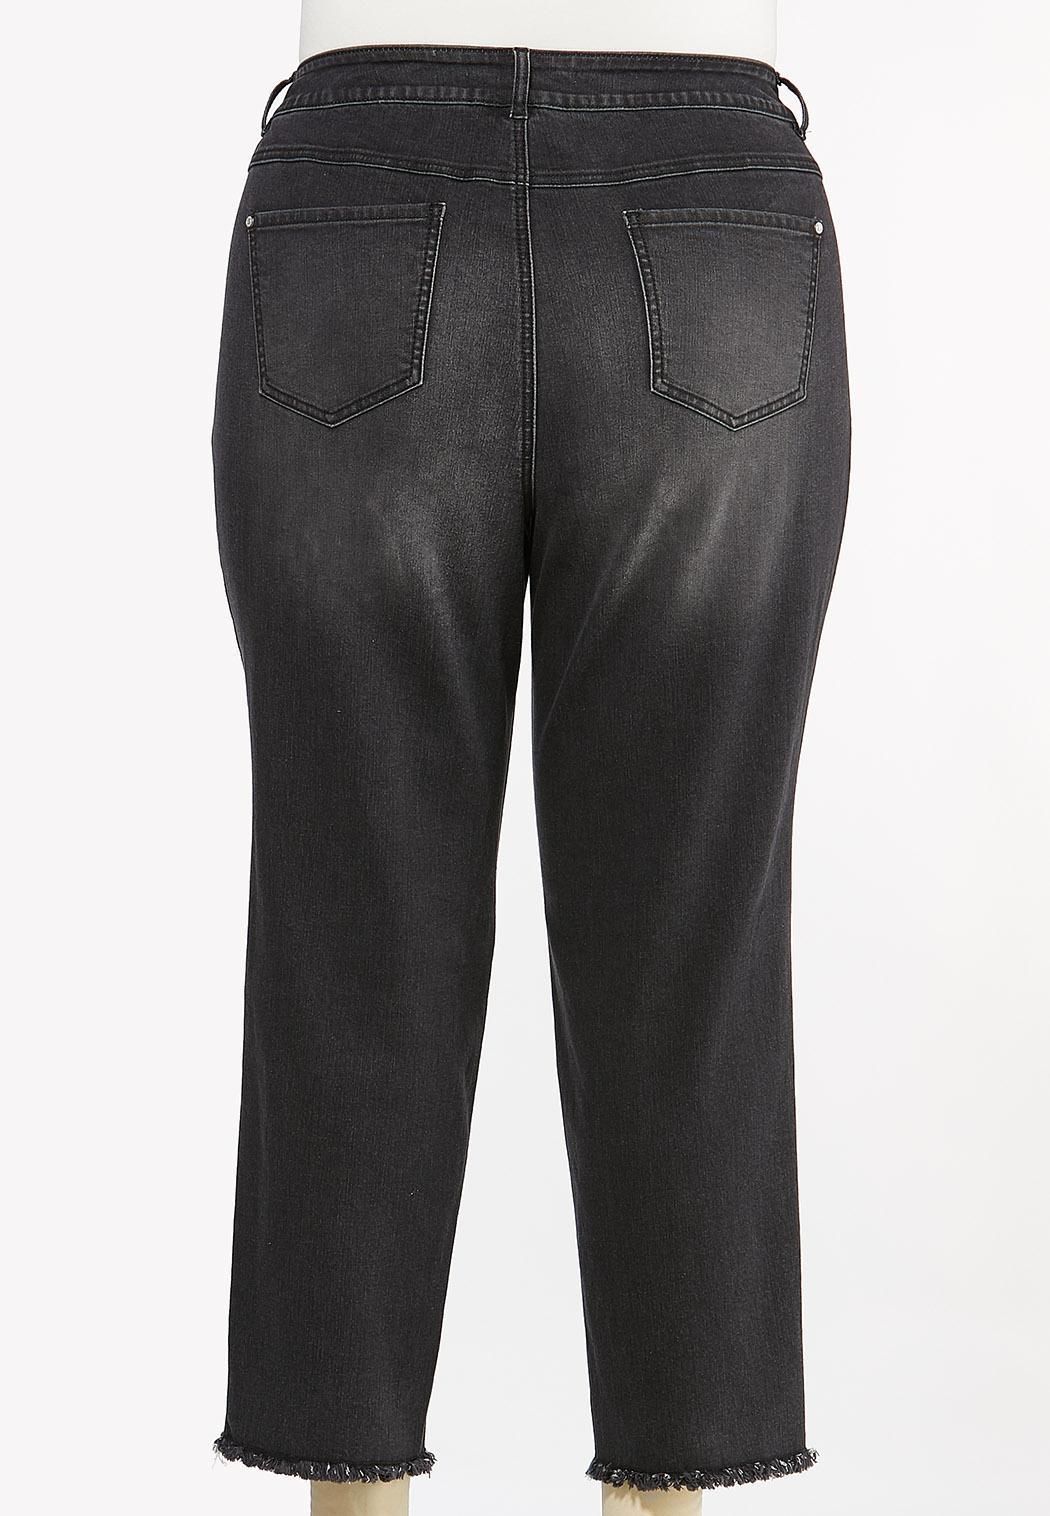 Plus Size Black Skinny Ankle Jeans (Item #44464078)